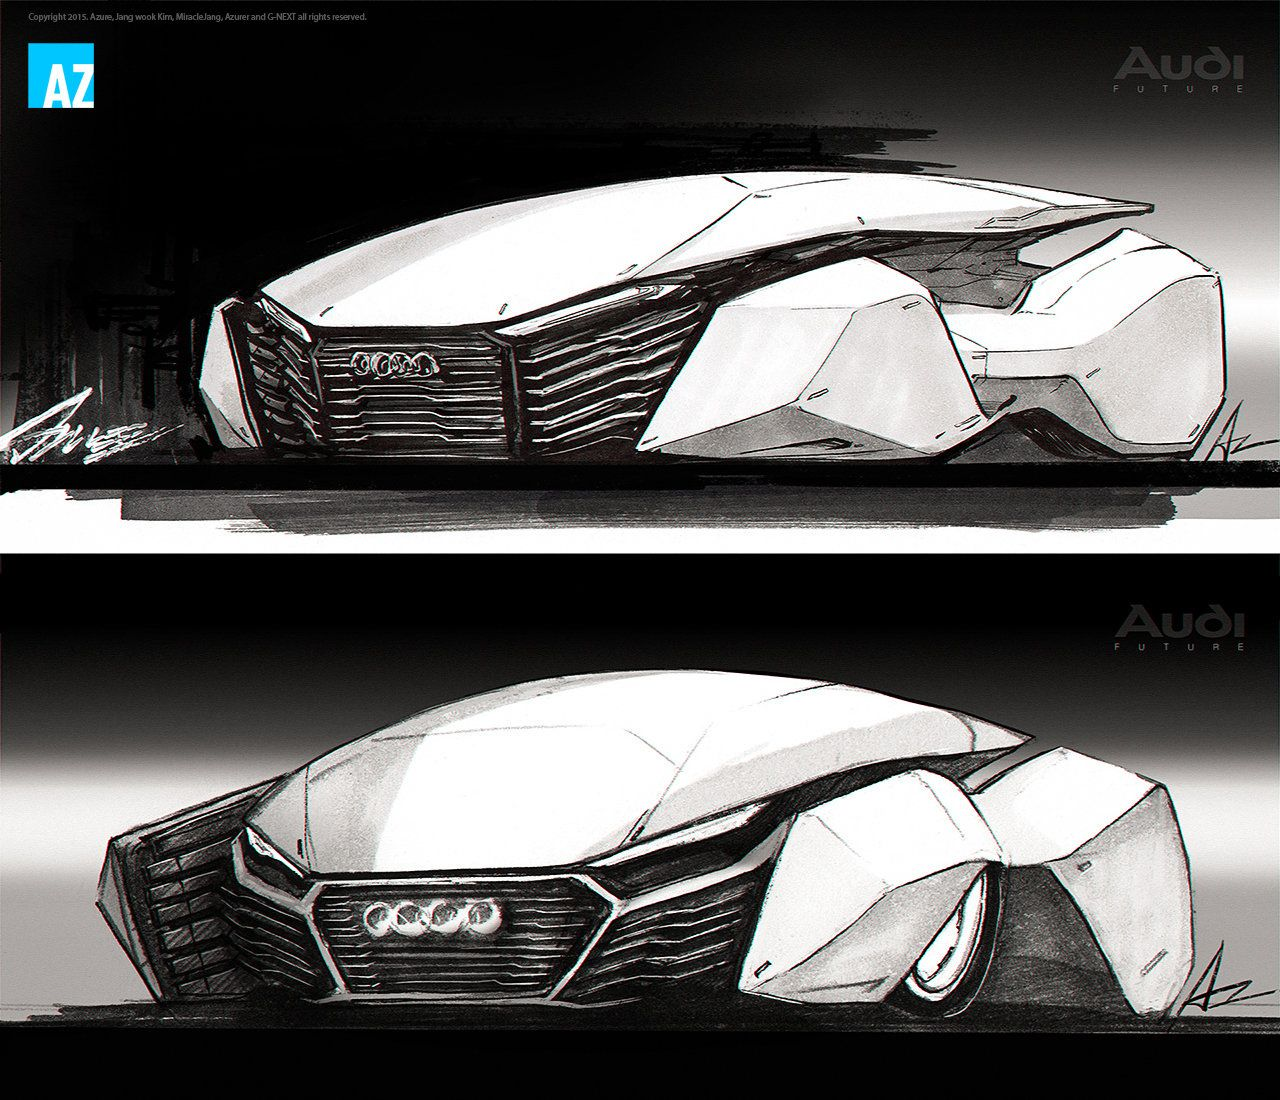 Future Cars: Future Audi R10, Jang Wook Kim On ArtStation At Https